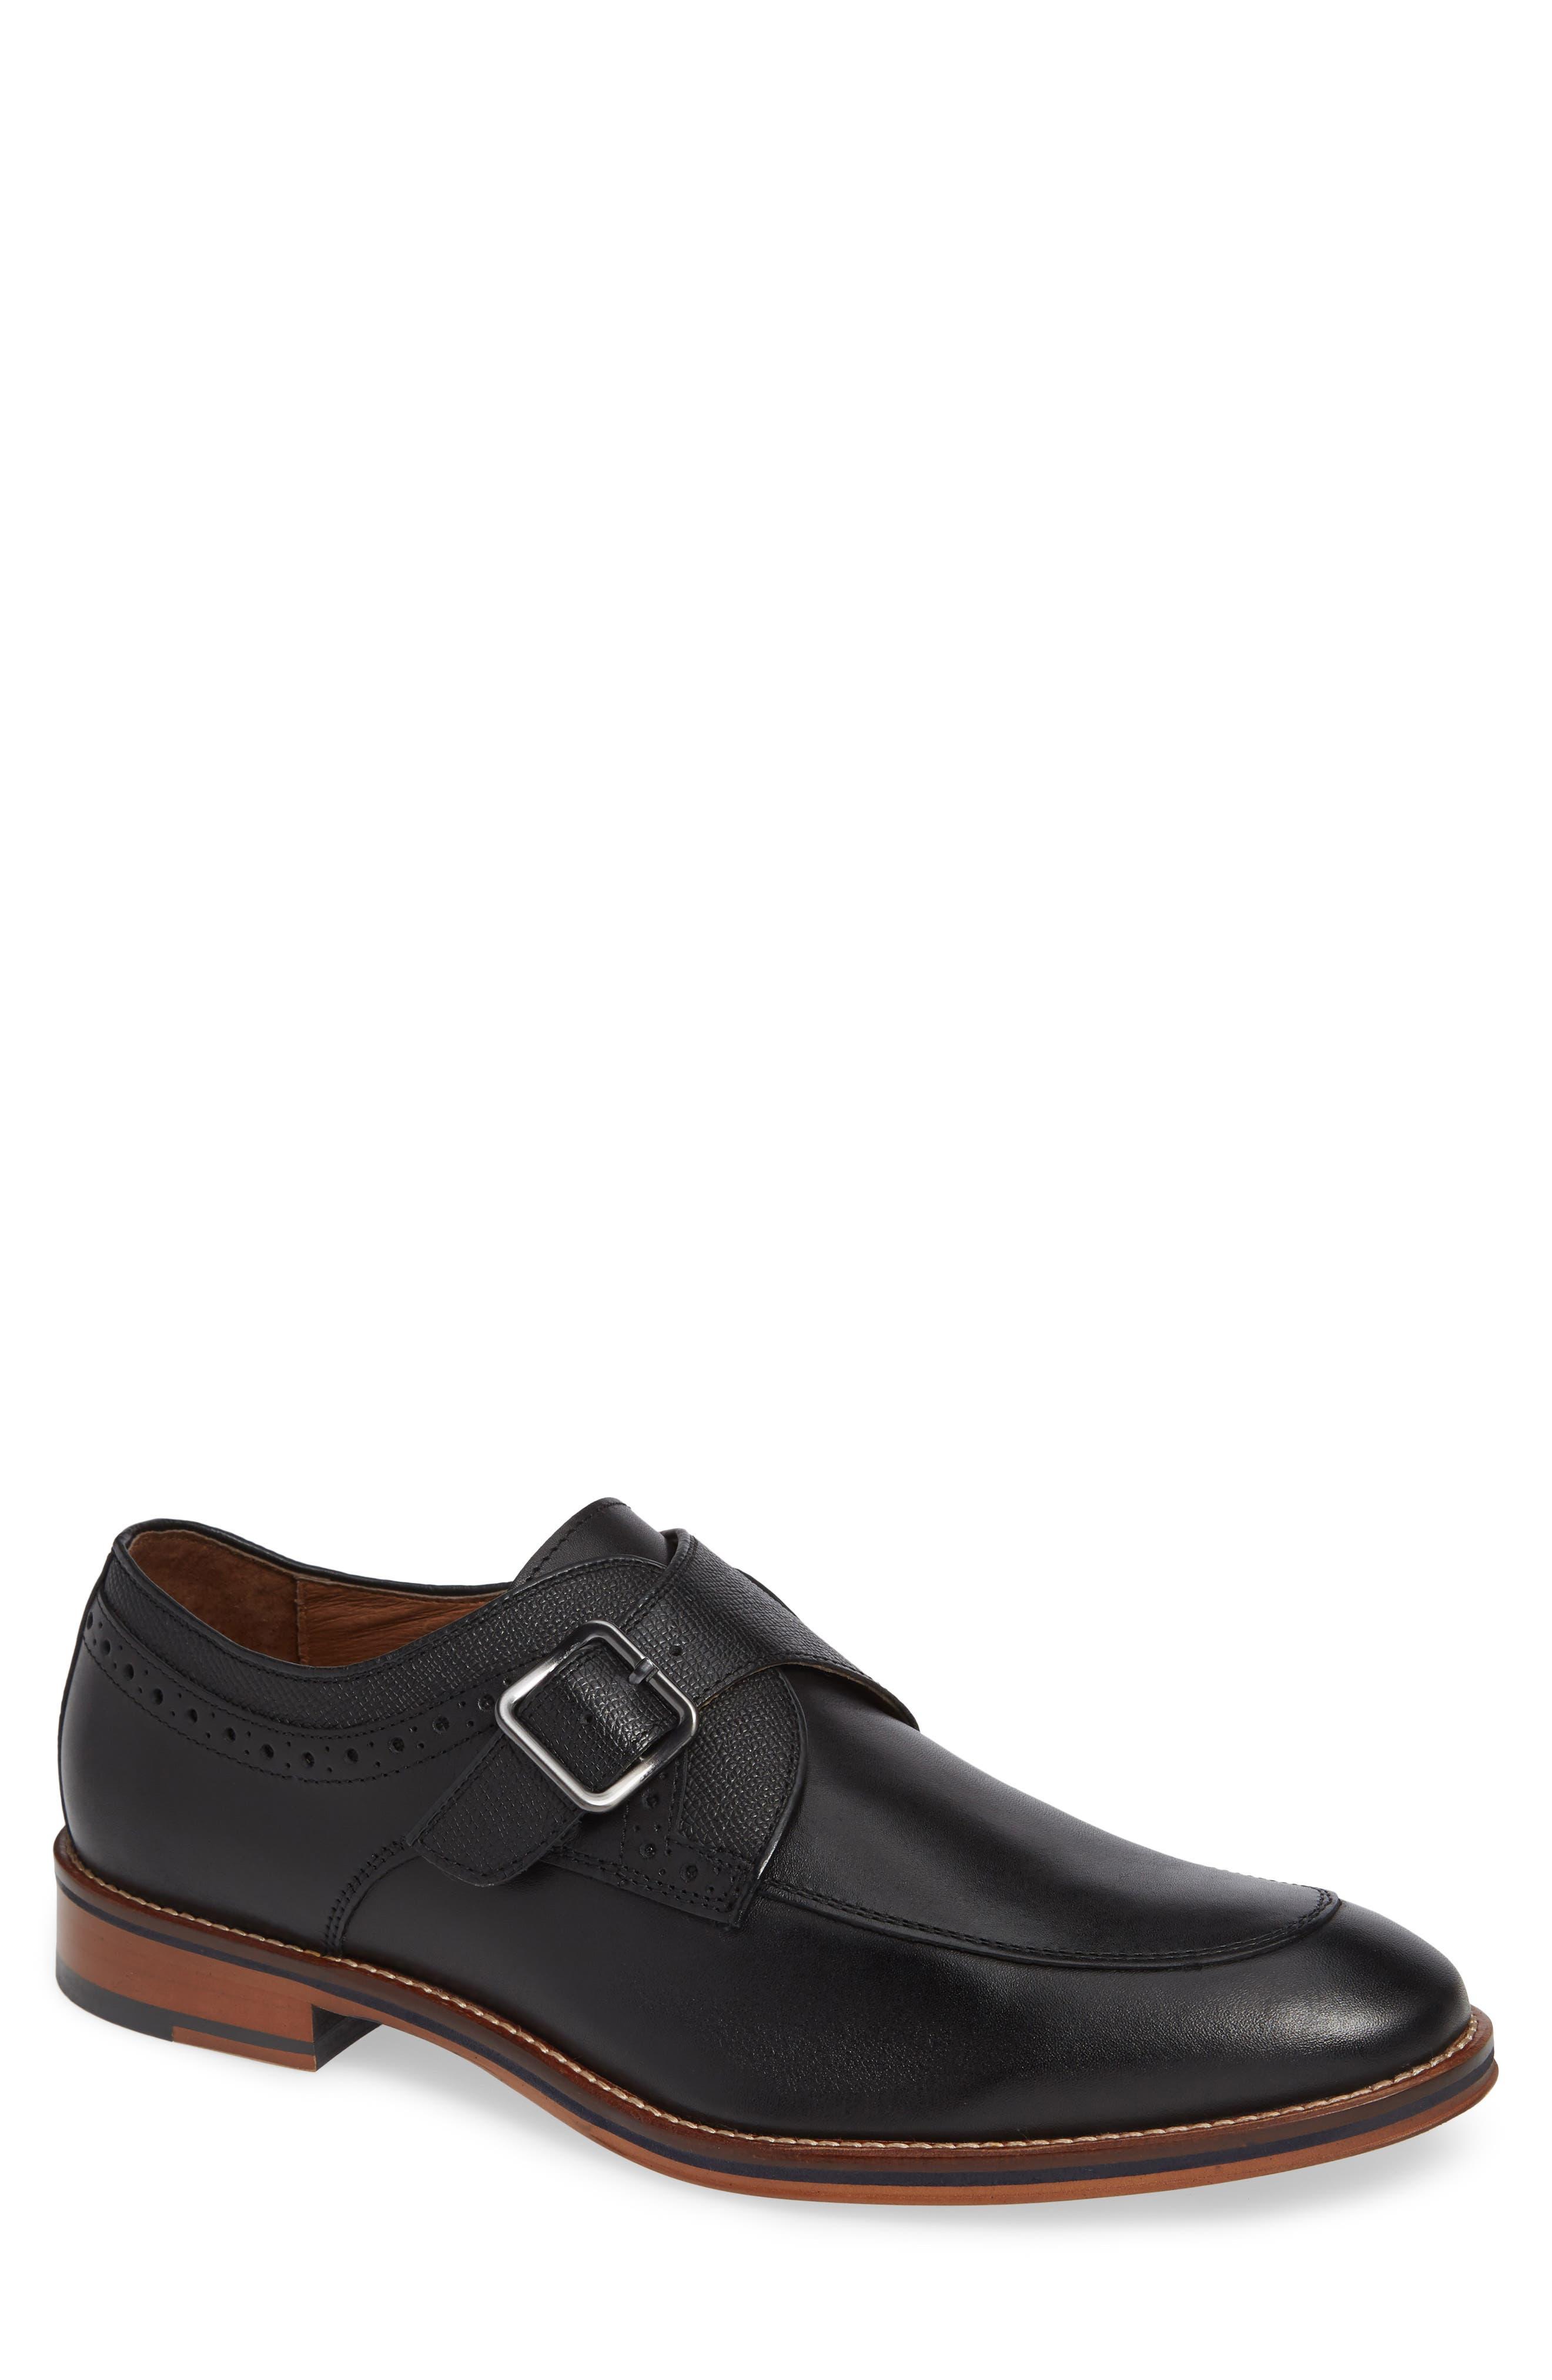 JOHNSTON & MURPHY, Conard Monk Strap Shoe, Main thumbnail 1, color, BLACK LEATHER